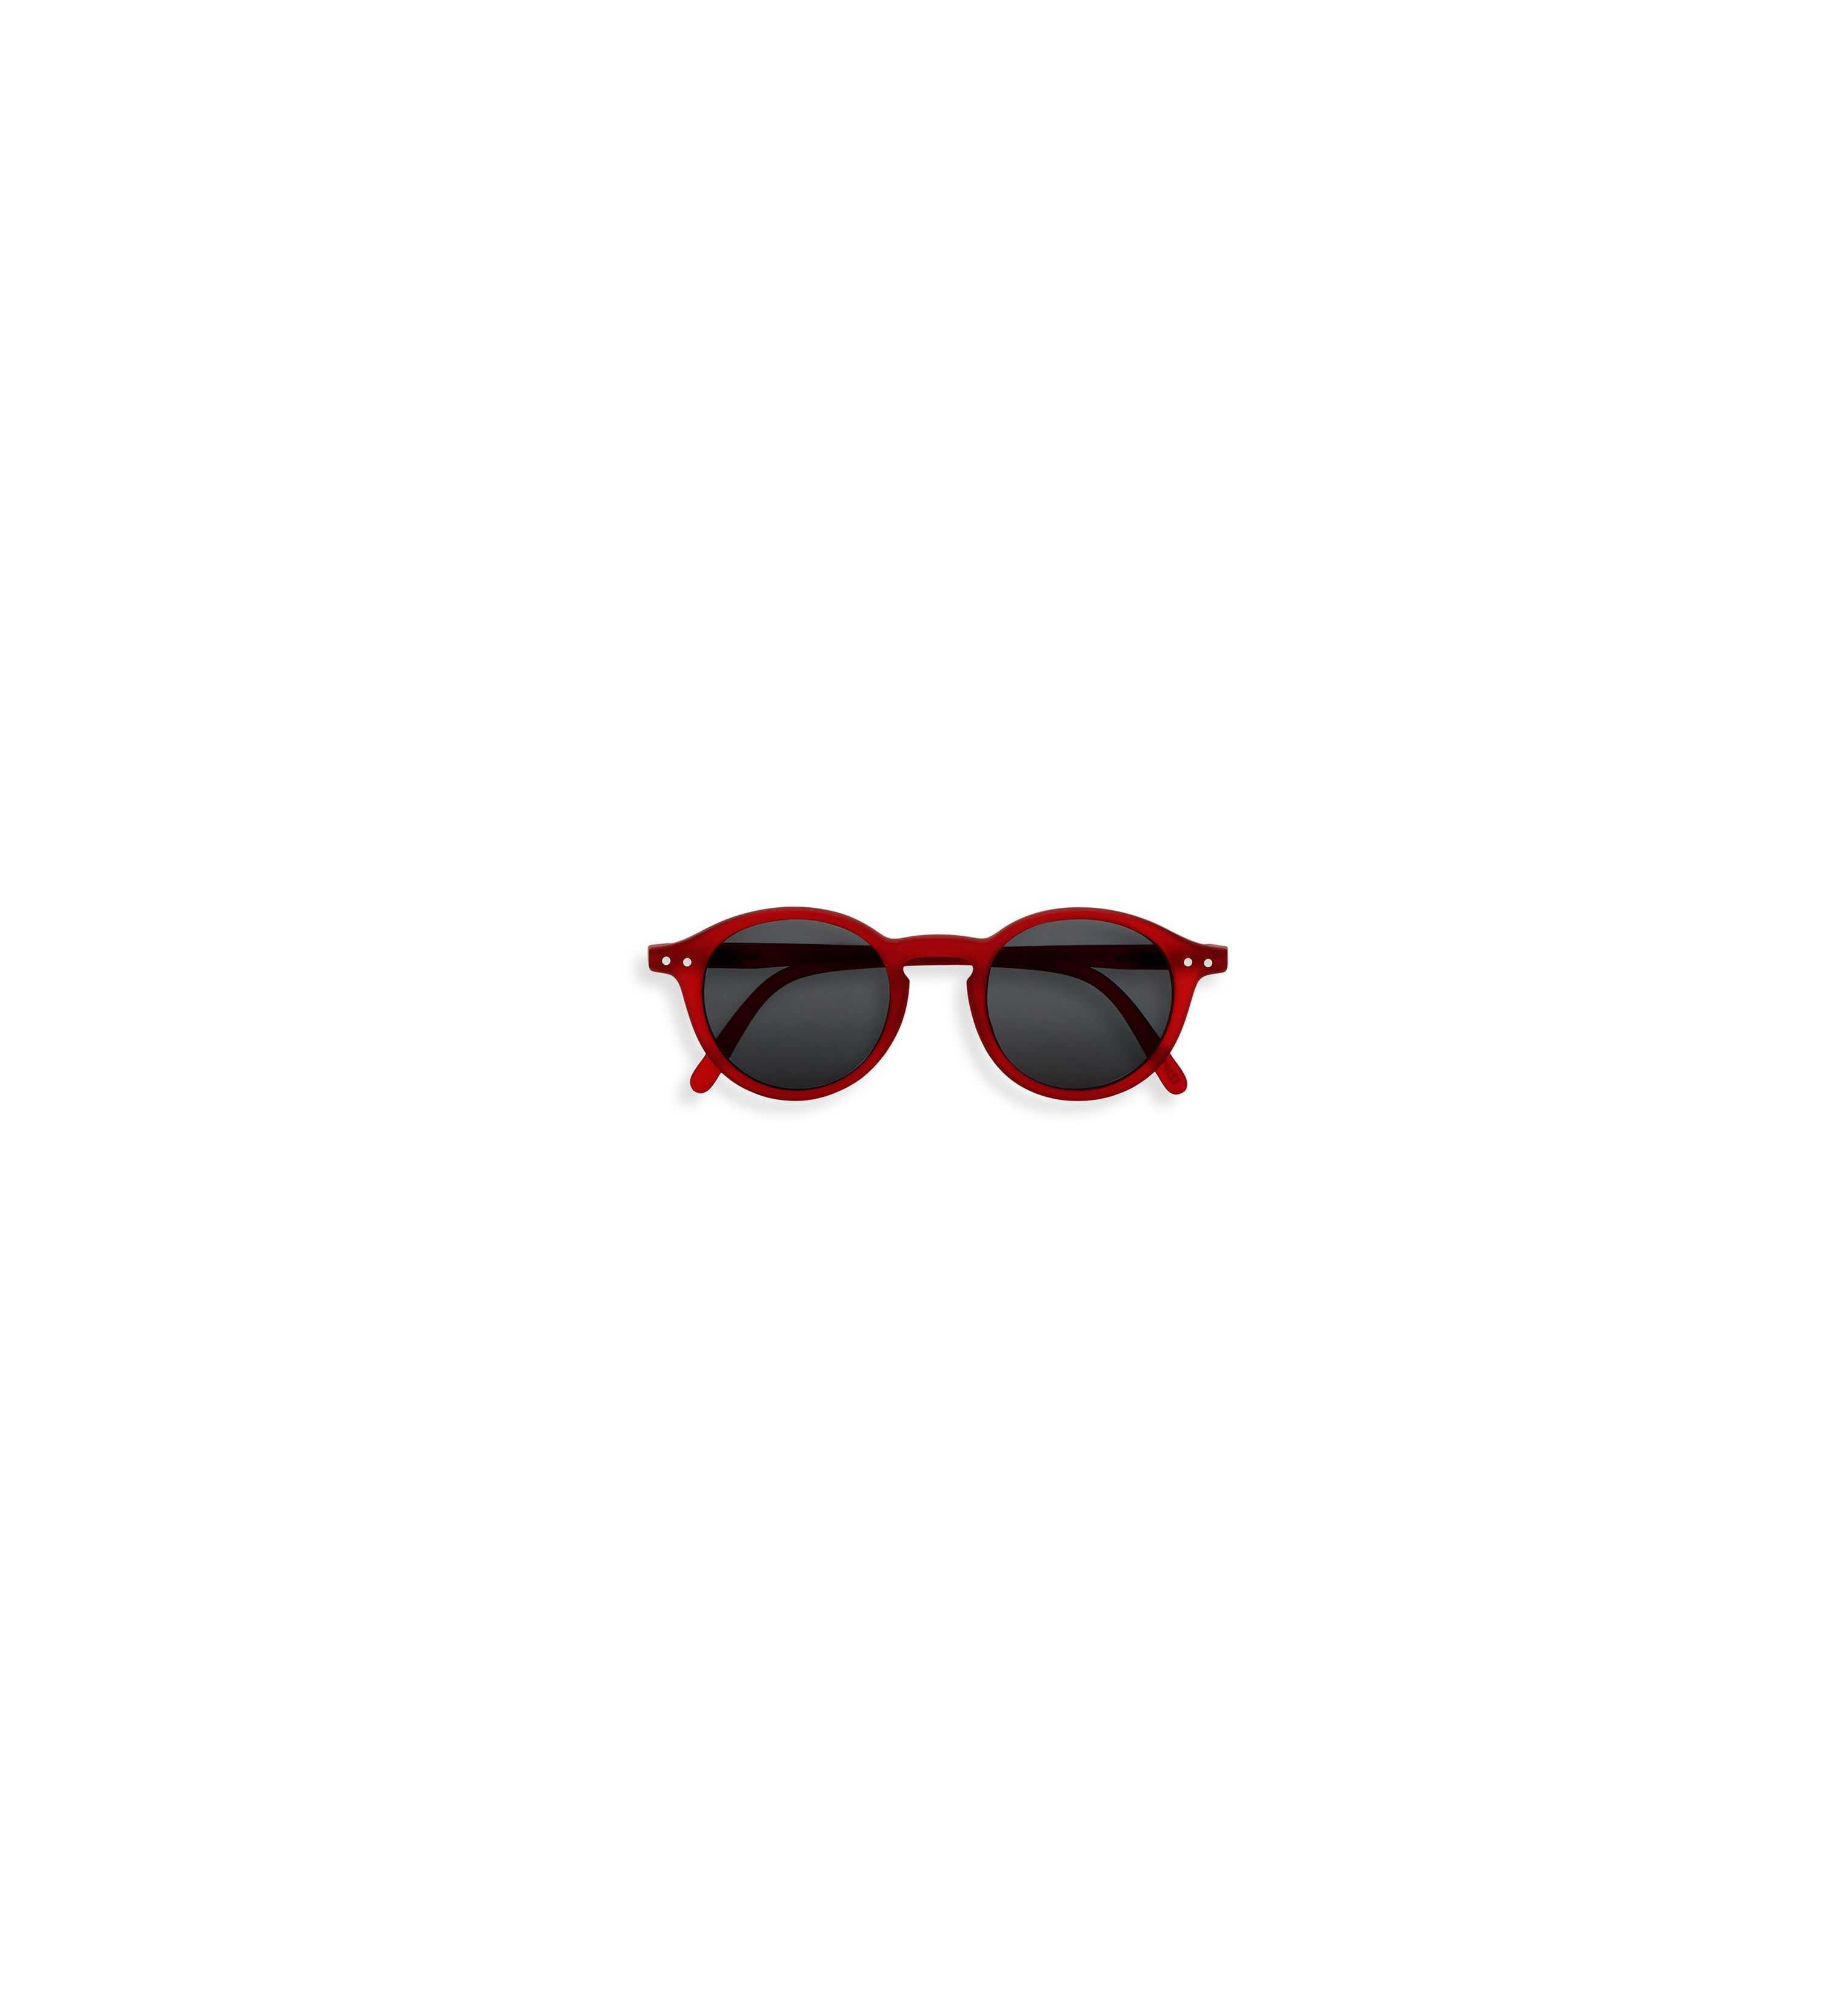 Lunettes de soleil junior red crystal D